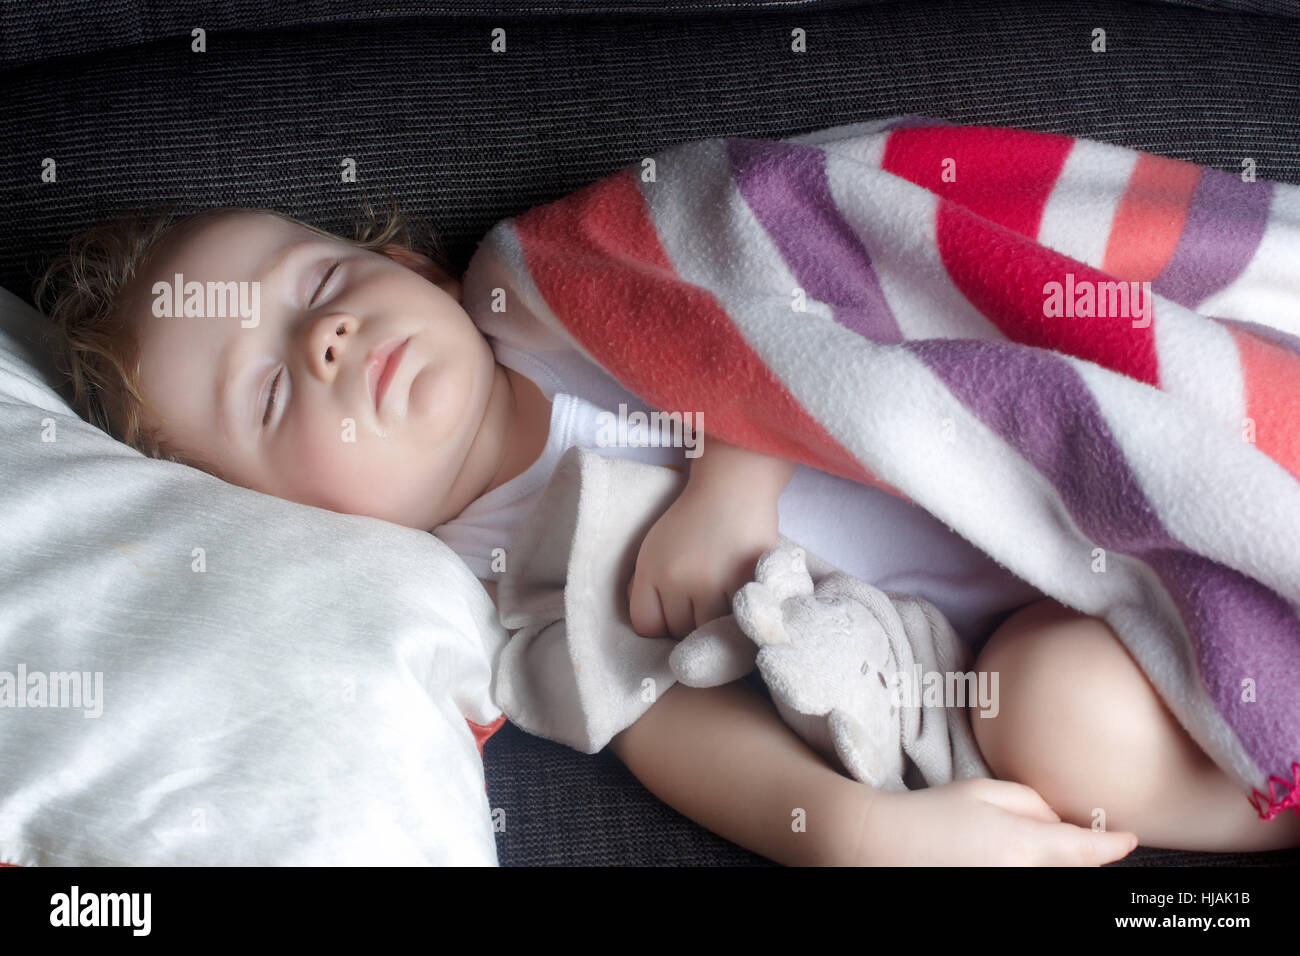 toy, sleep, sleeping, maddening, pert, coquettish, cute, child, humans, human - Stock Image